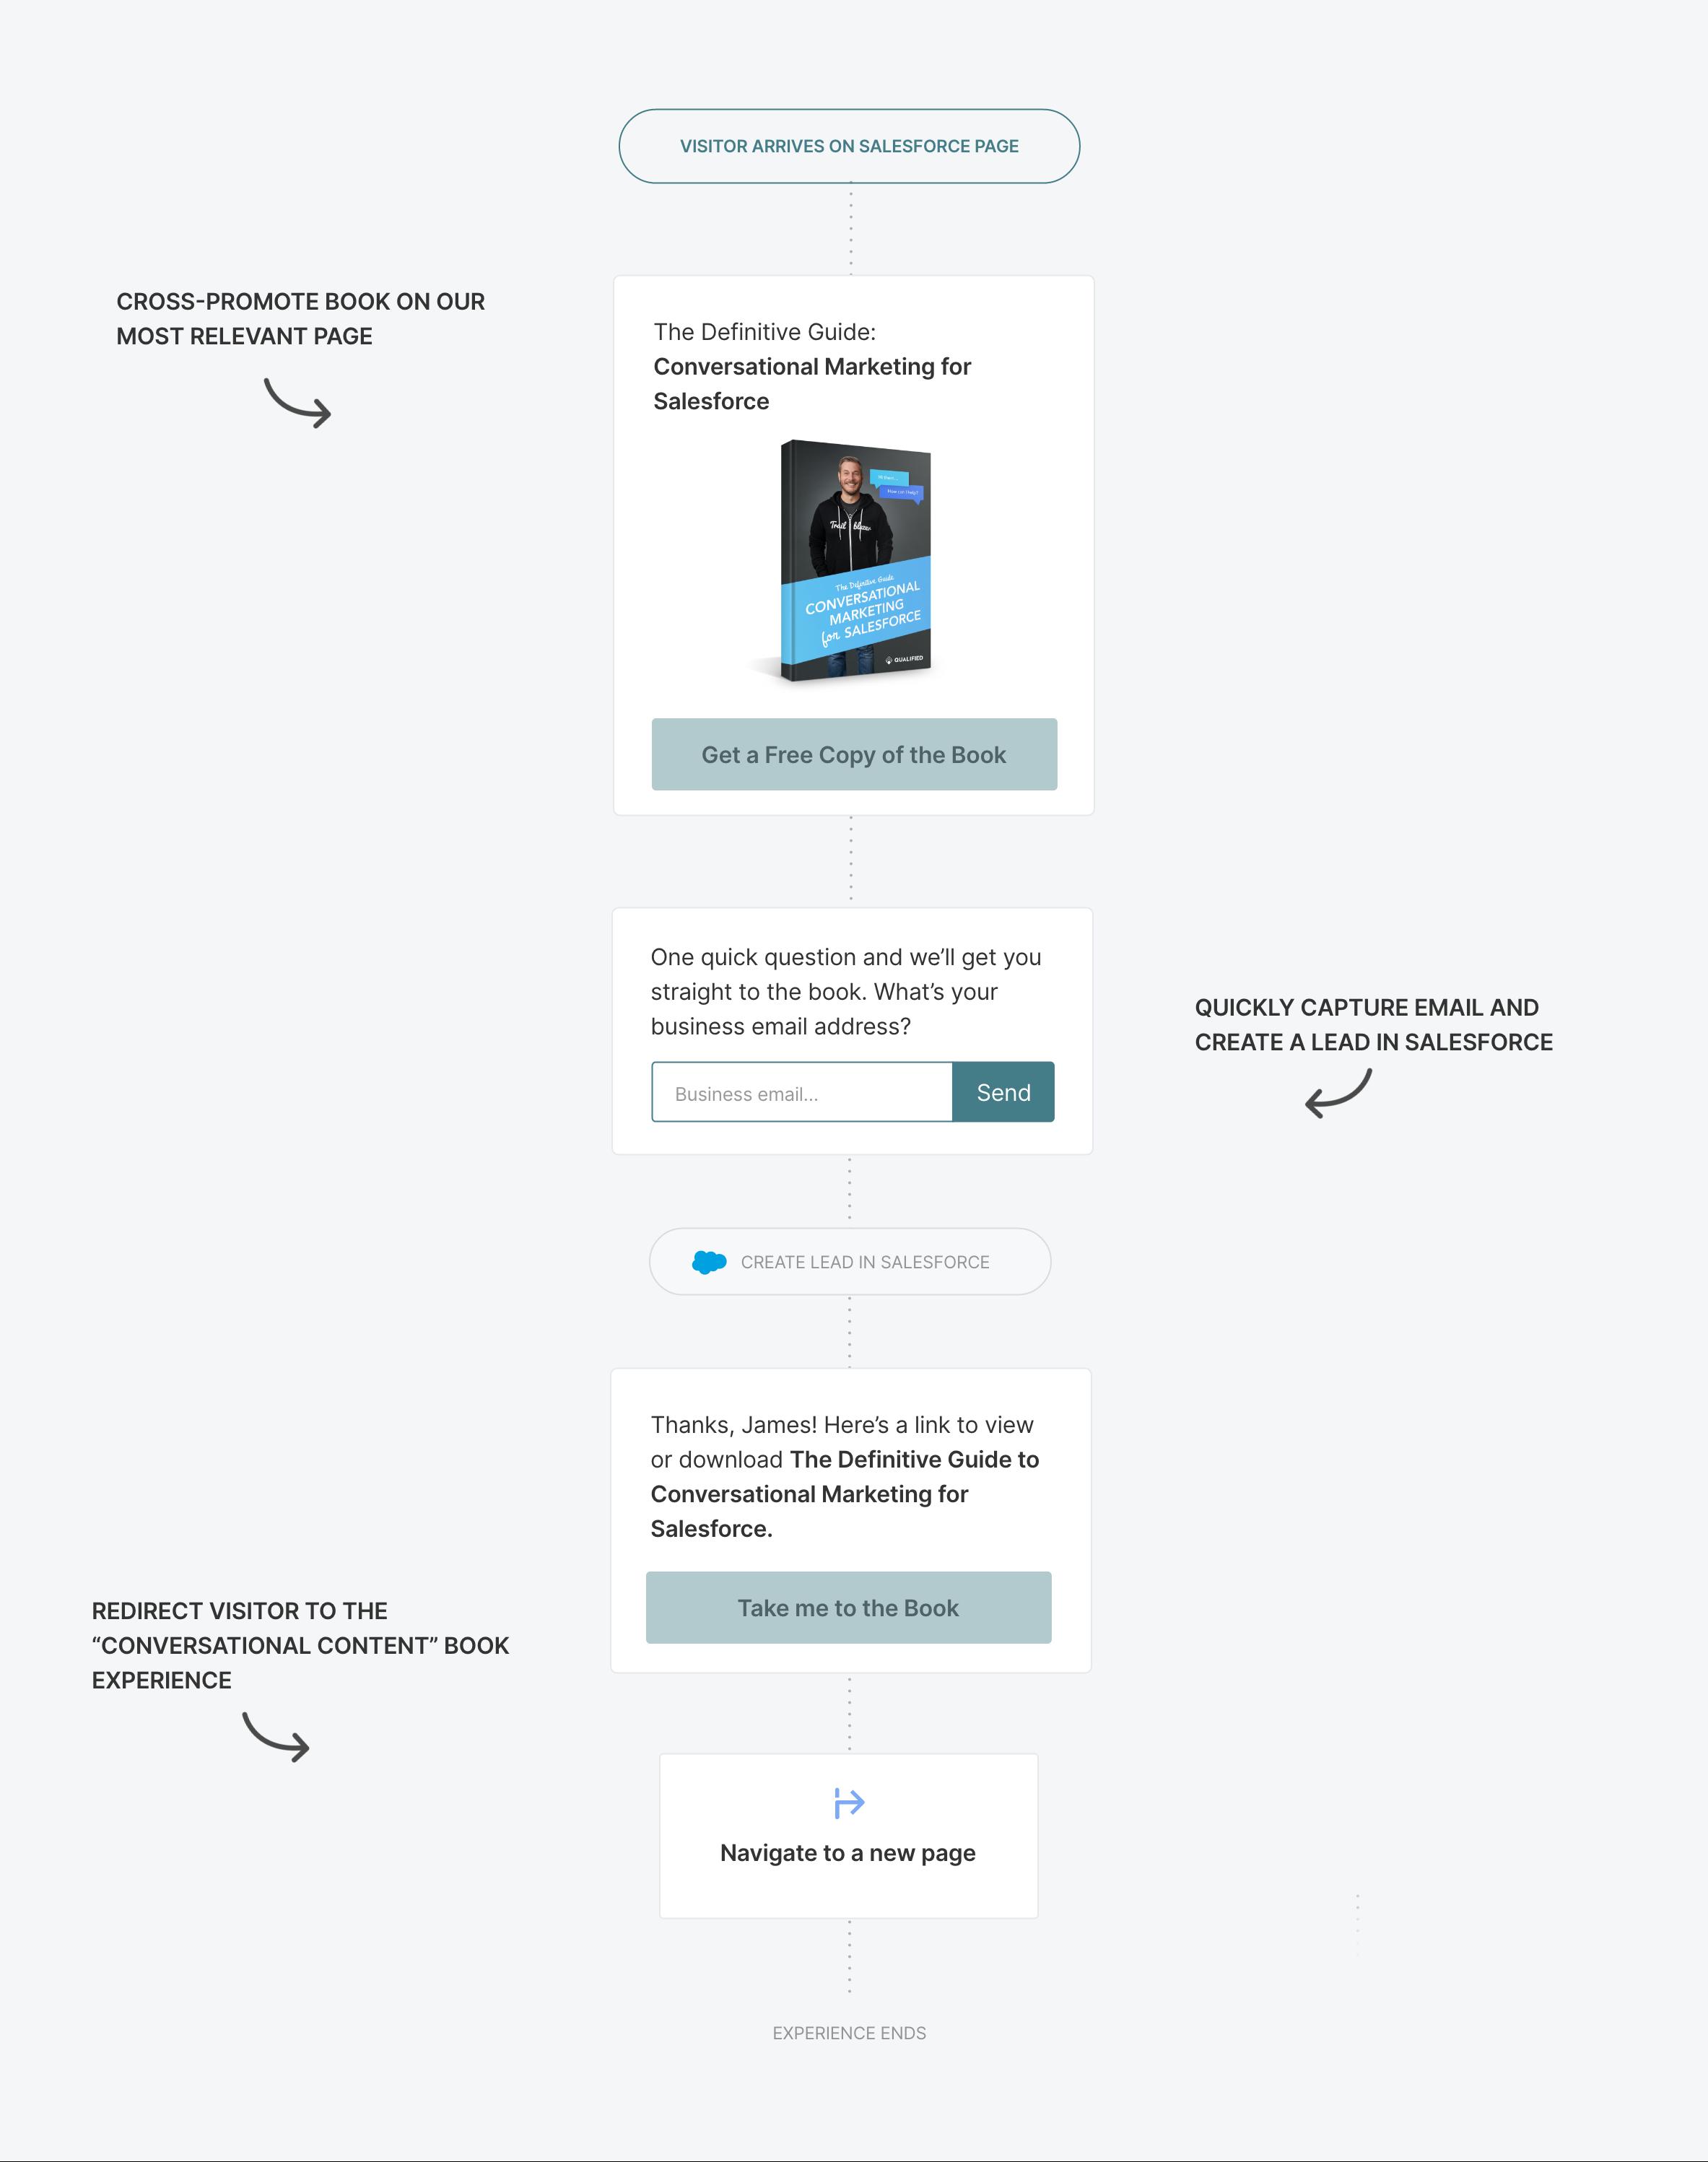 Cross-promotion Conversational Marketing experience